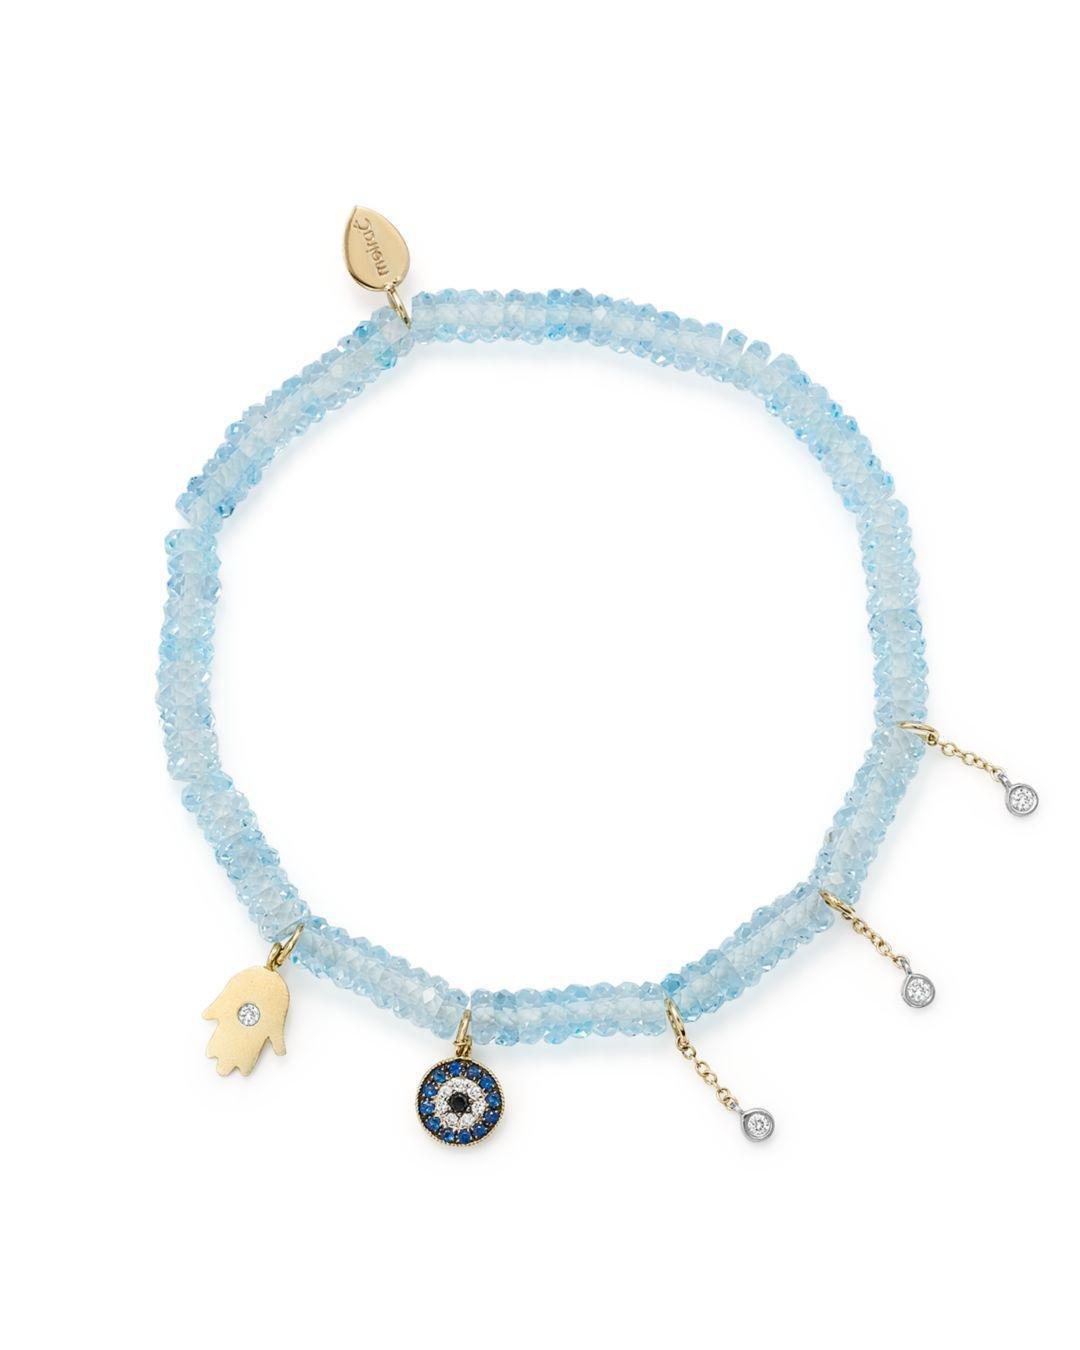 5b6462a26d727 Meira T. Women s 14k White   Yellow Gold Evil Eye   Hamsa Hand Charm Beaded  Stretch Bracelet ...